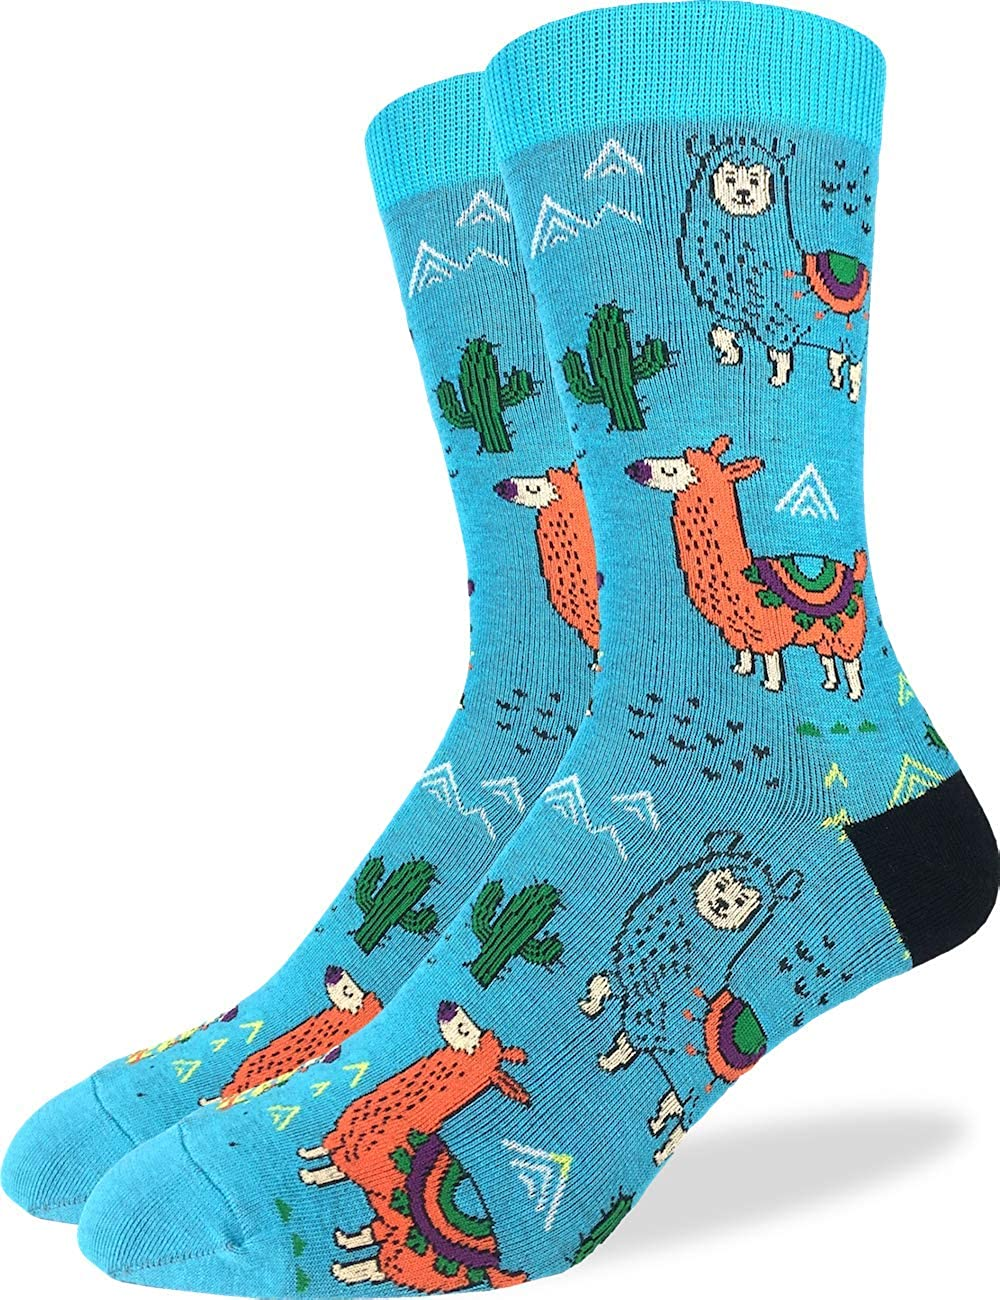 Good Luck Sock Men's Extra Large Fun Llamas Socks, Size 13-17, Big & Tall